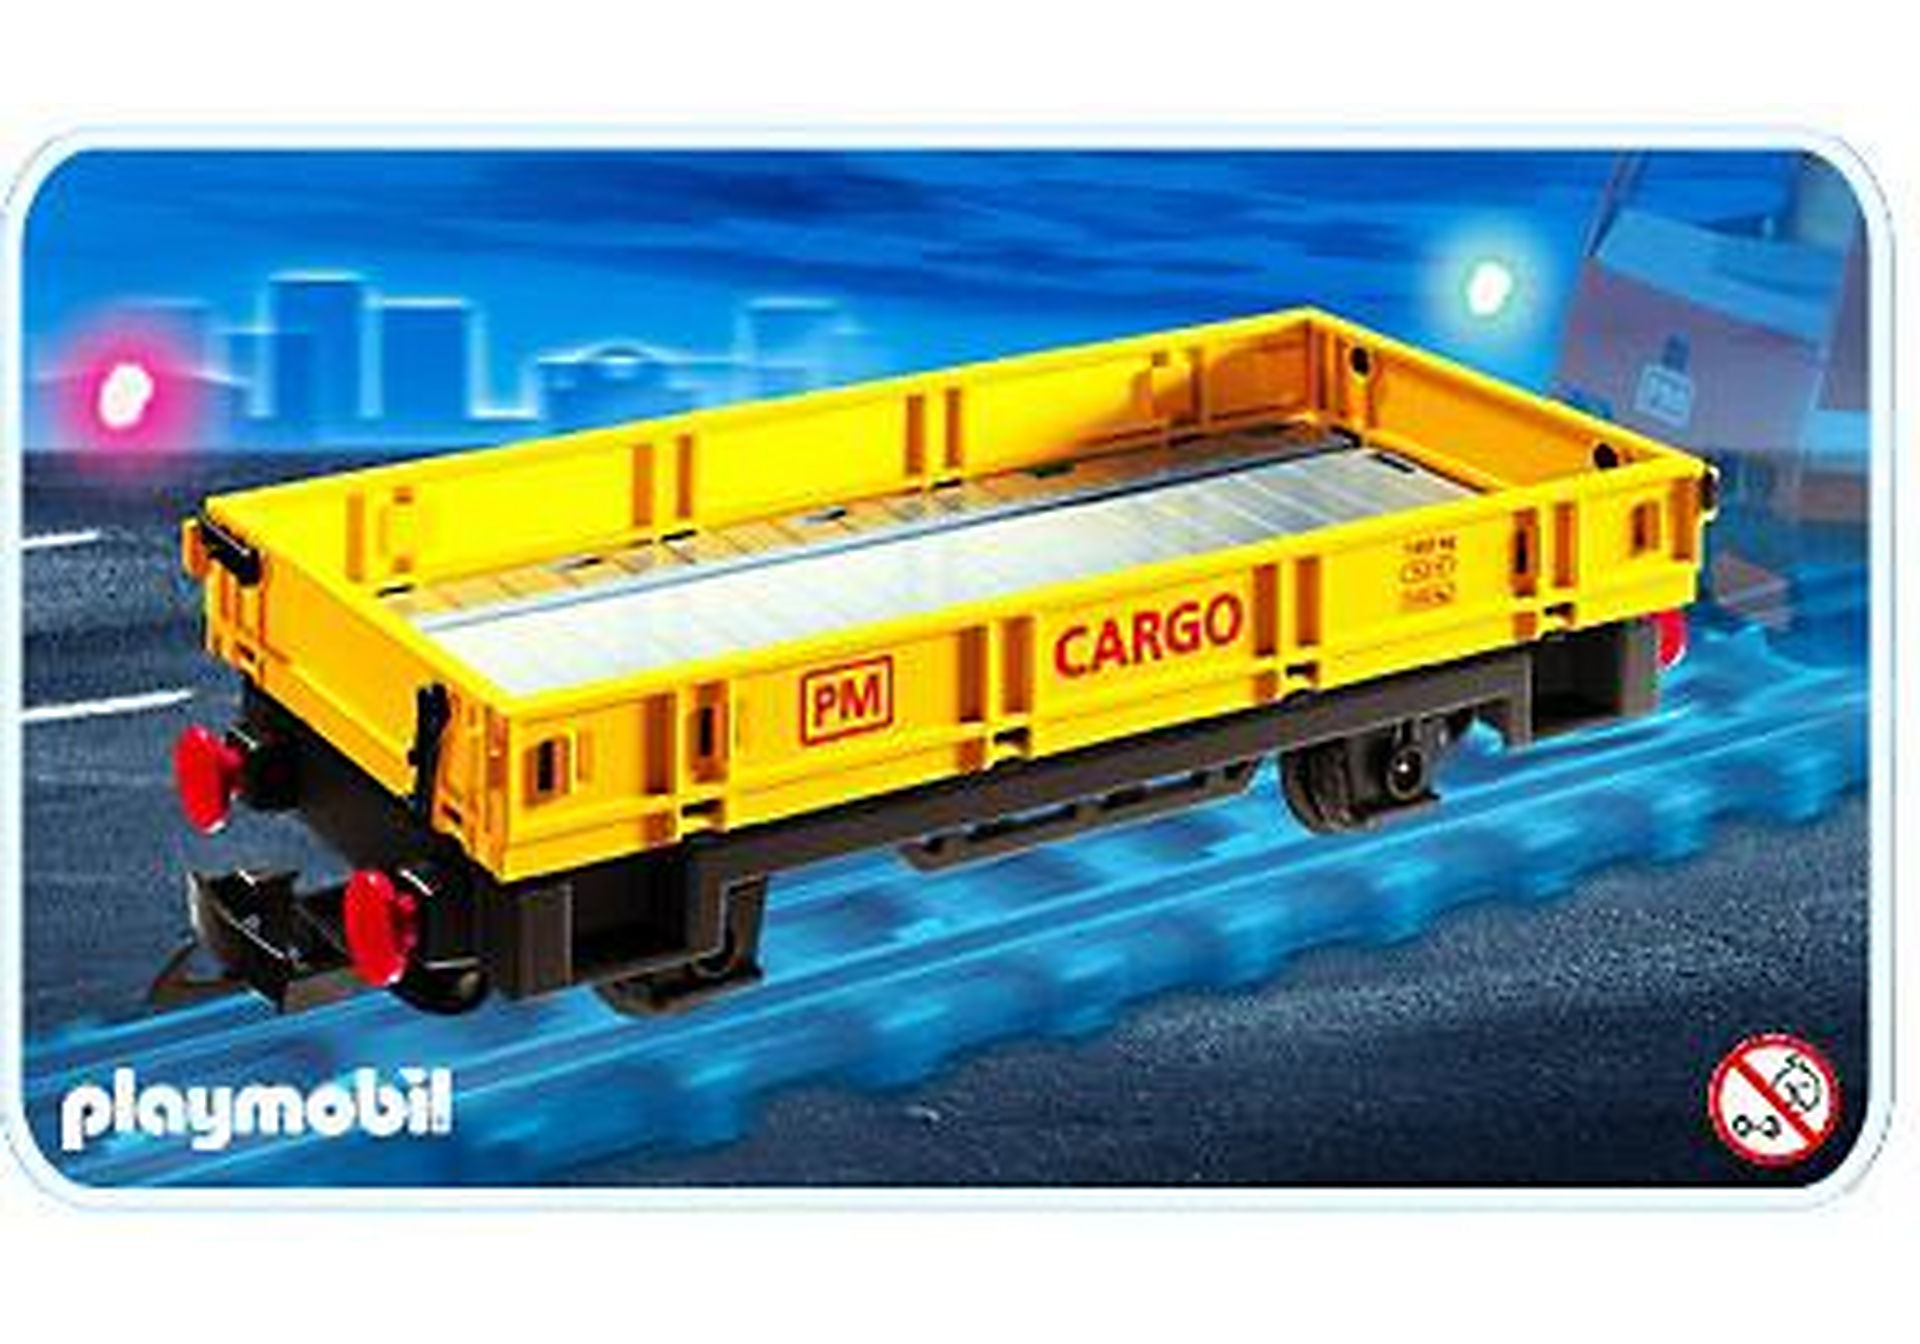 4126-A Wagon plate-forme zoom image1